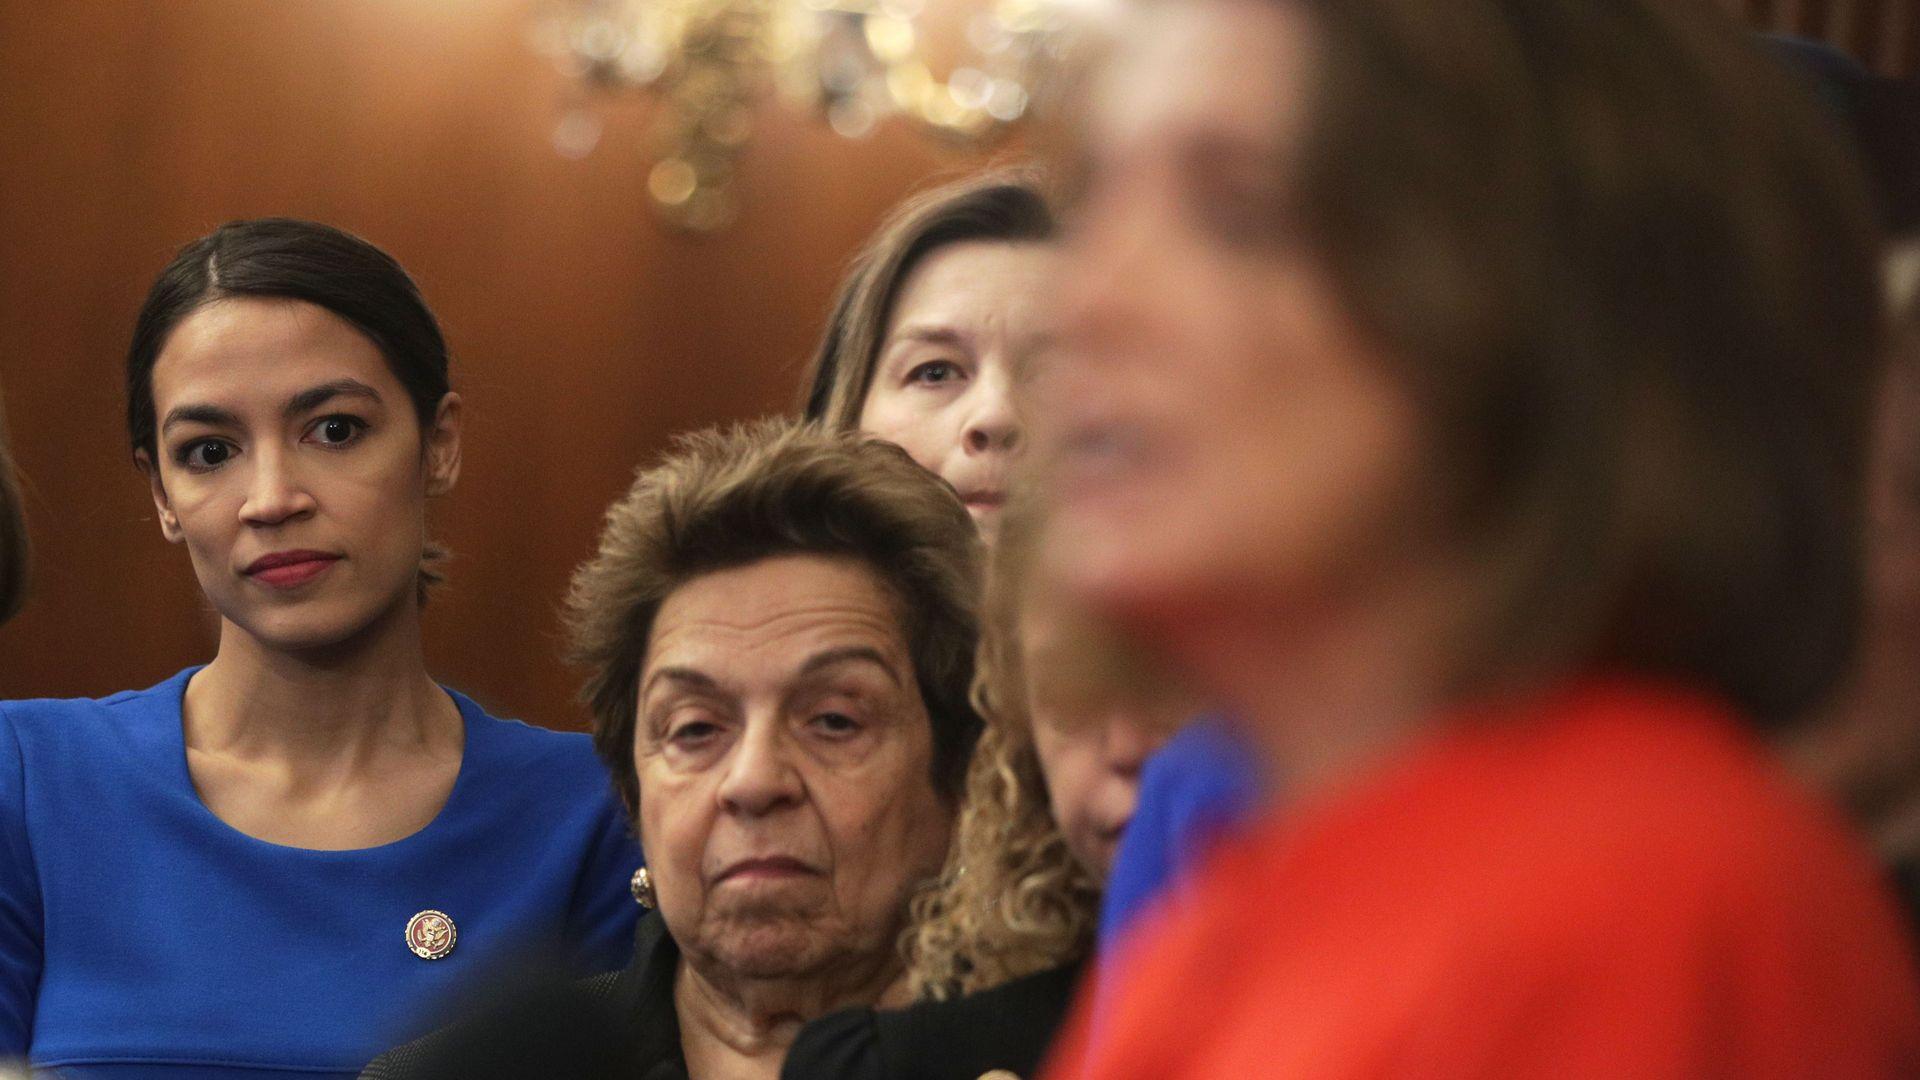 U.S. Rep. Kathy Castor (D-FL), Rep. Alexandria Ocasio-Cortez (D-NY), and Rep. Donna Shalala (D-FL) listen as Speaker of the House Rep. Nancy Pelosi (D-CA) speak.